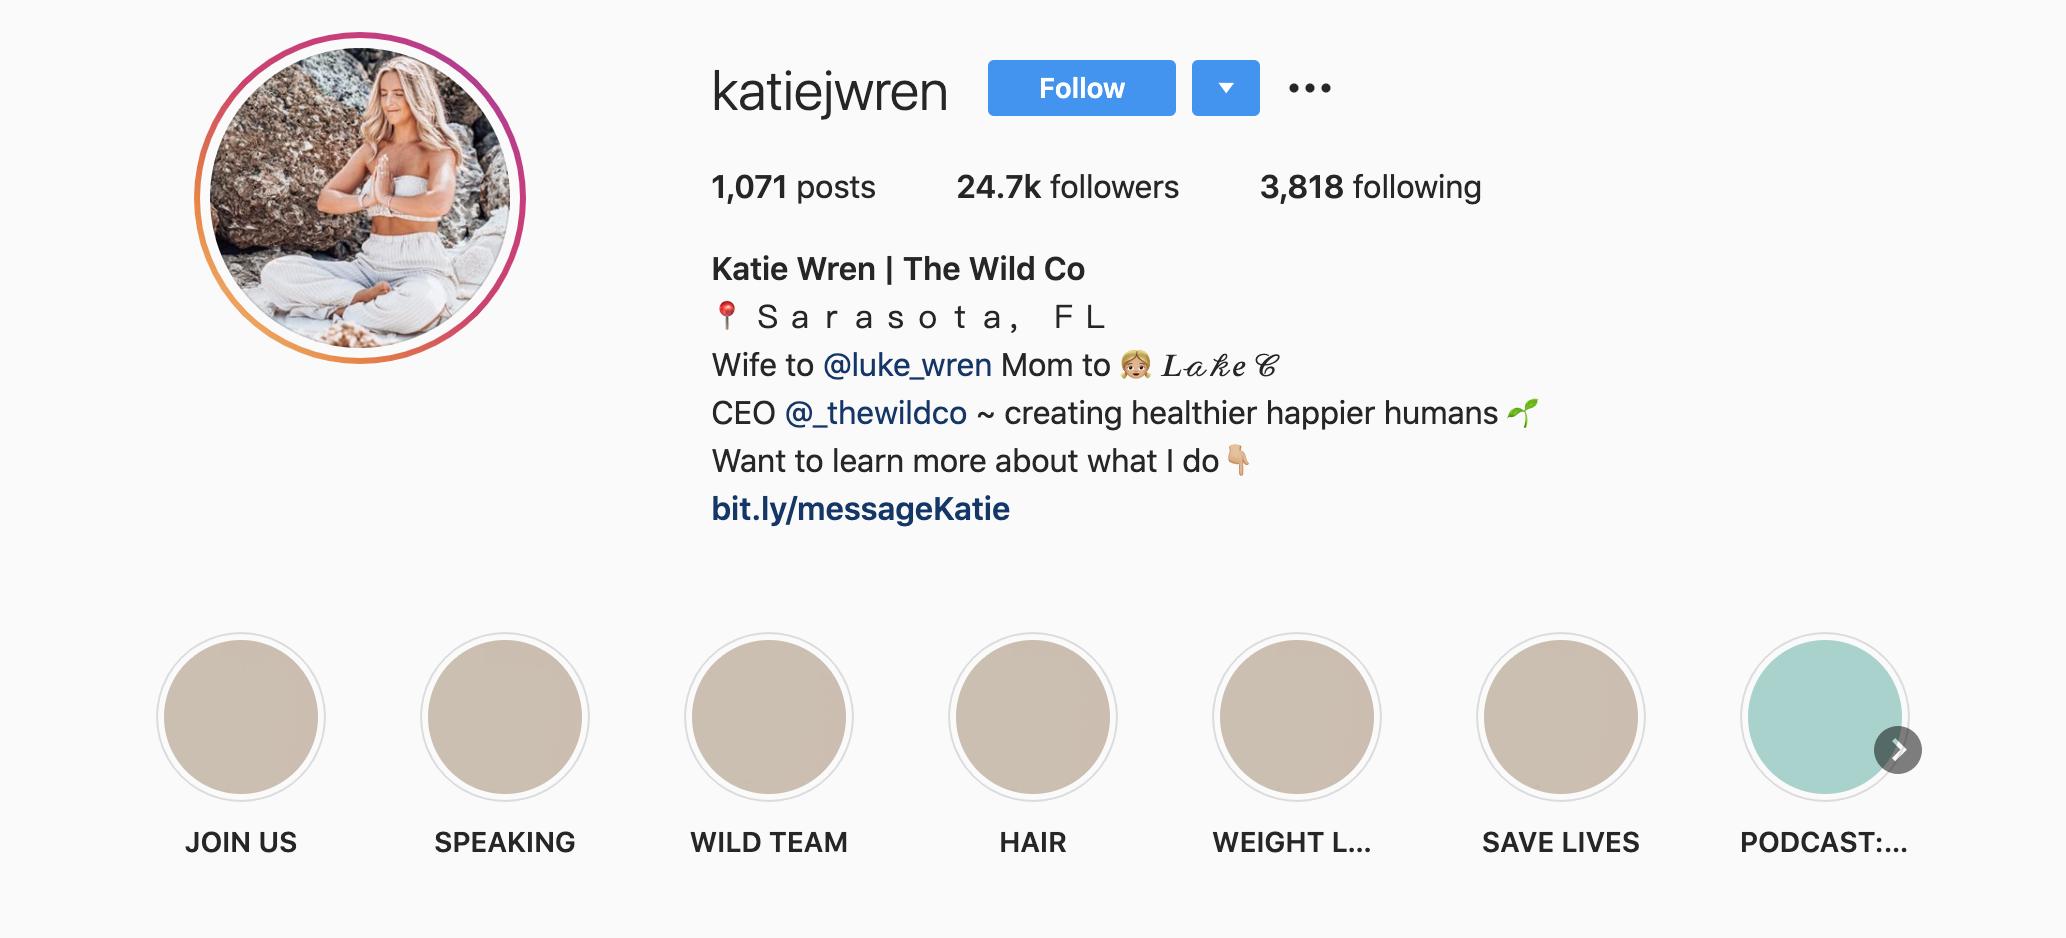 Katie Wren is a Successful Female Mentor in Europe